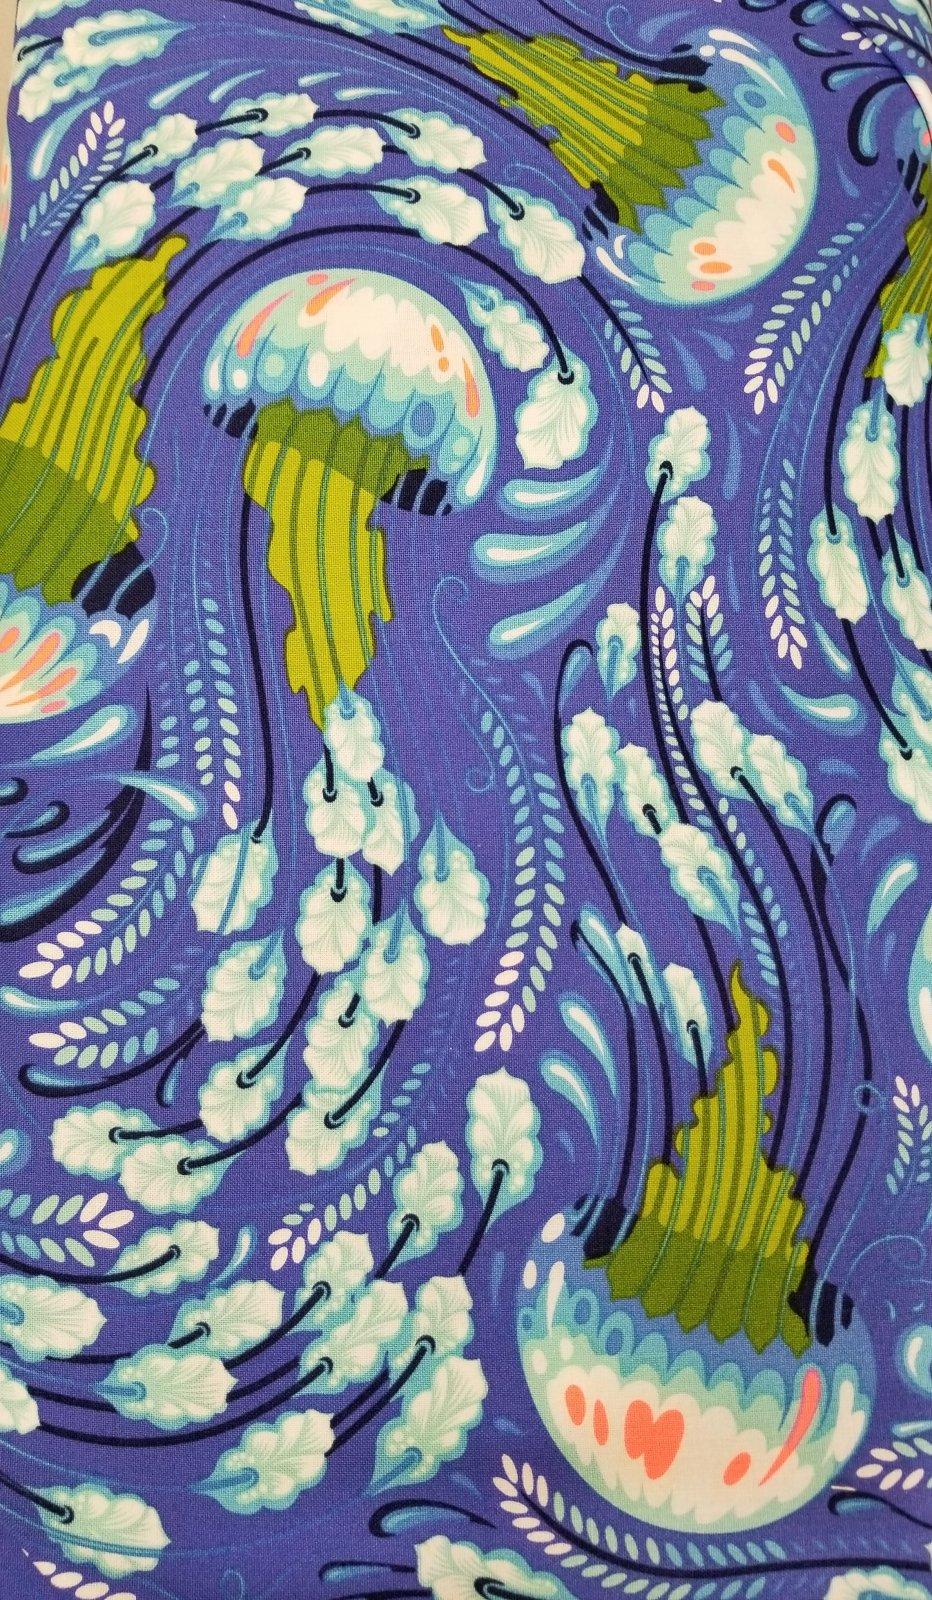 Zuma - Sea Bloom (Aquamarine) by Tula Pink